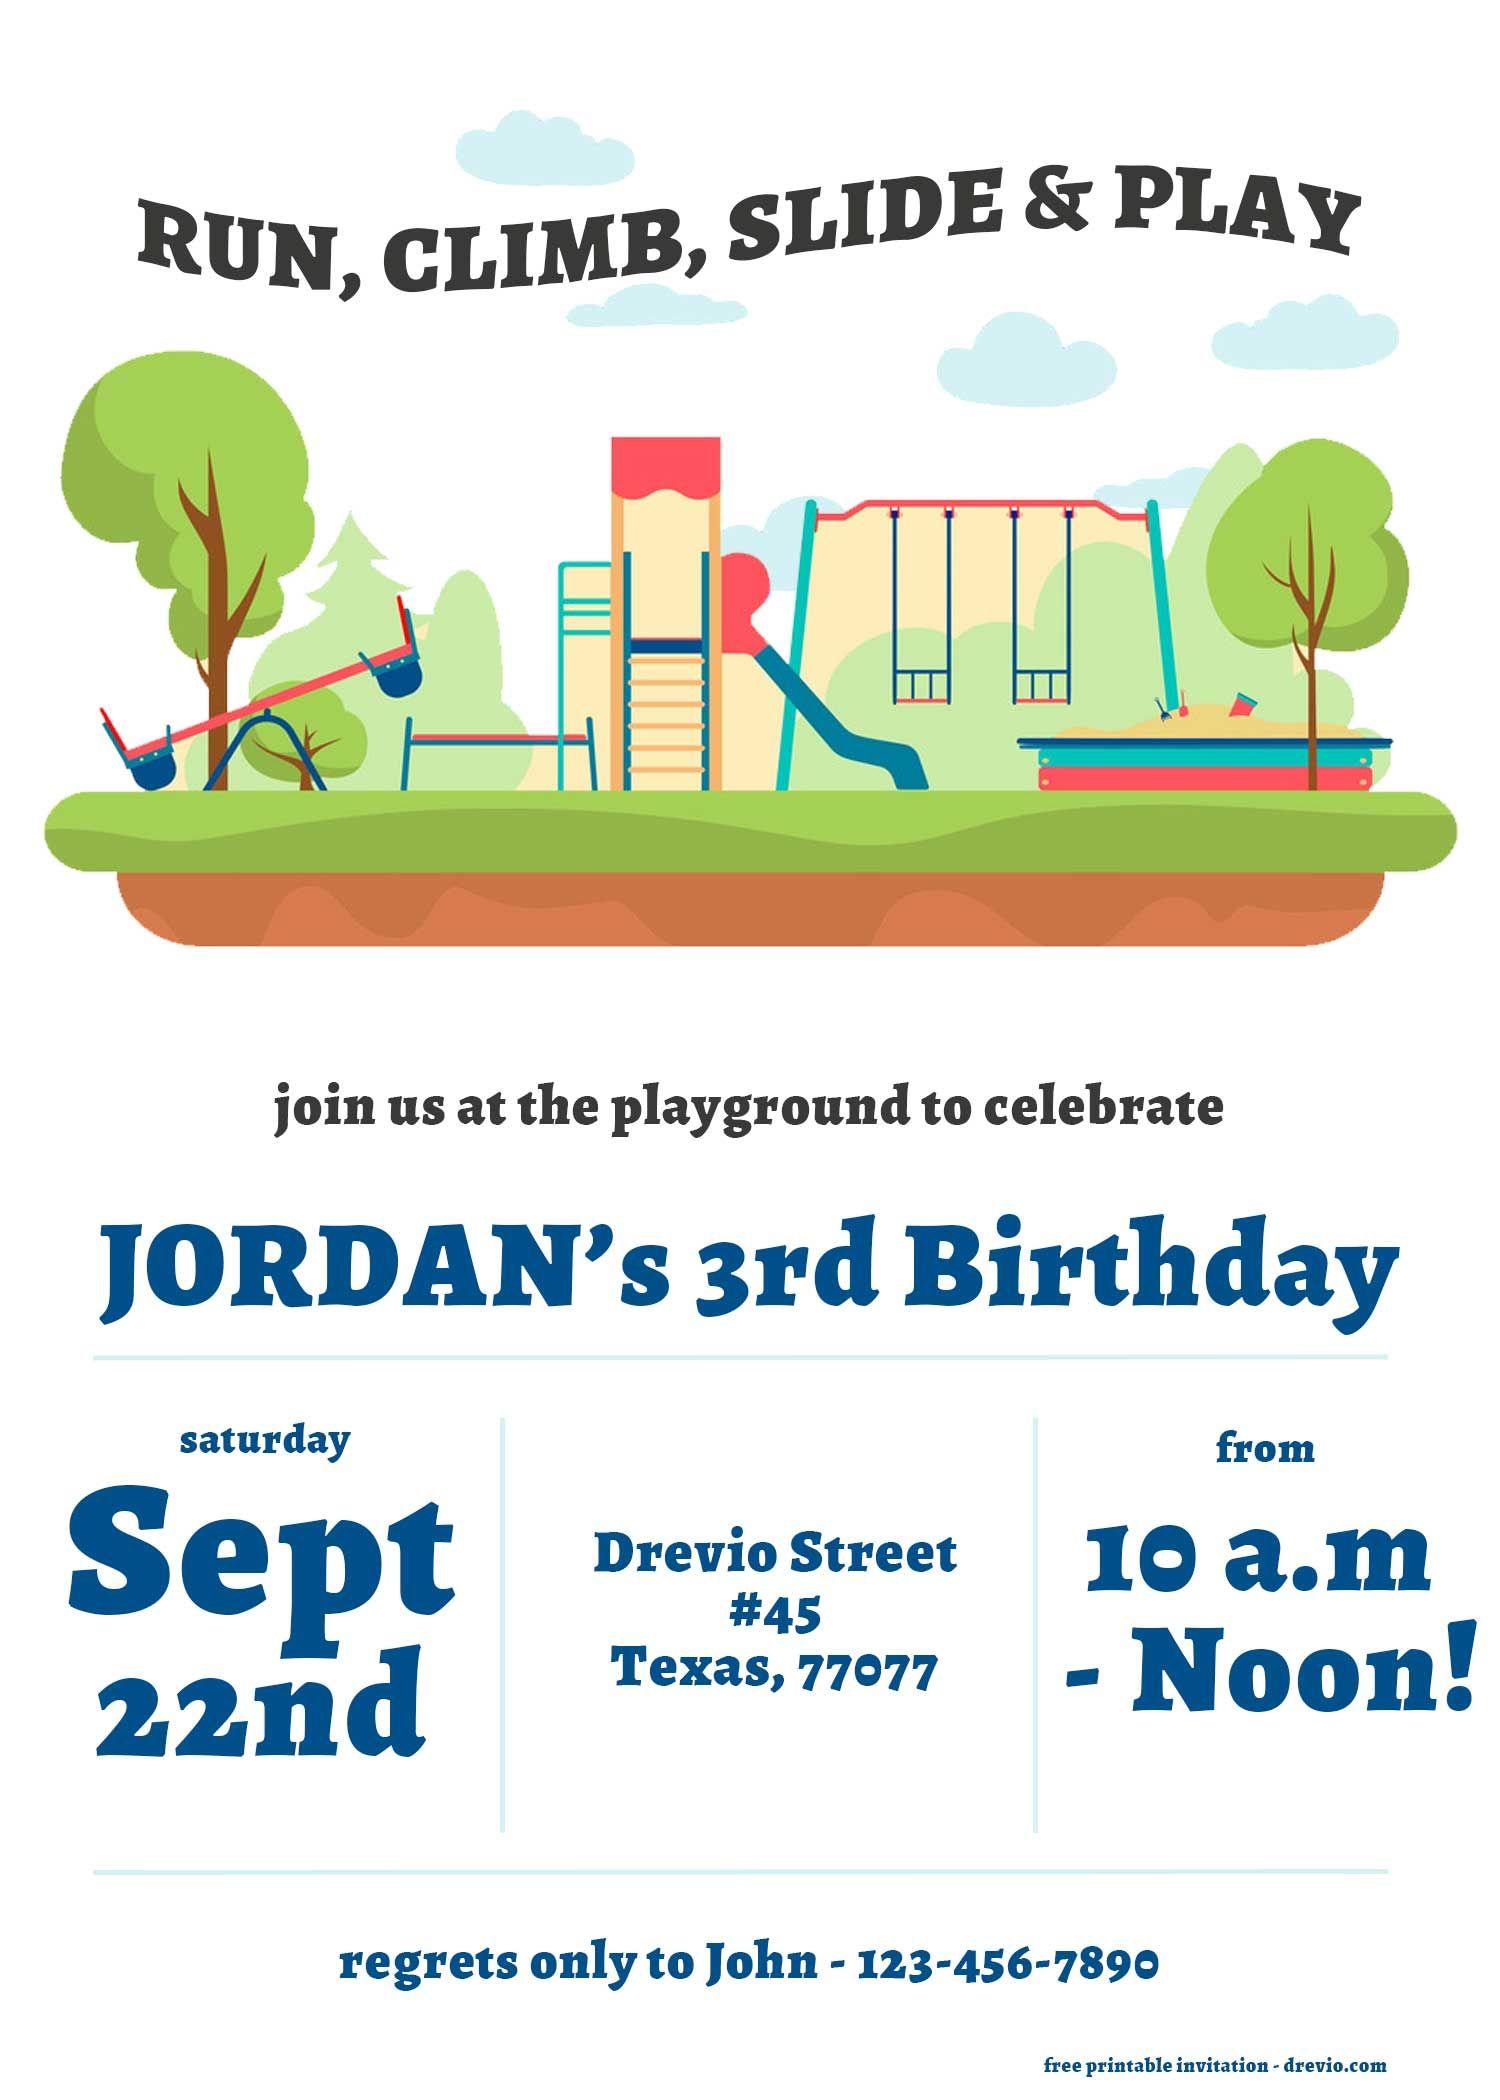 Free Playground Run Climb Slide And Play Invitation Templates Free Printable Birthday Invitations Playground Birthday Parties Park Birthday